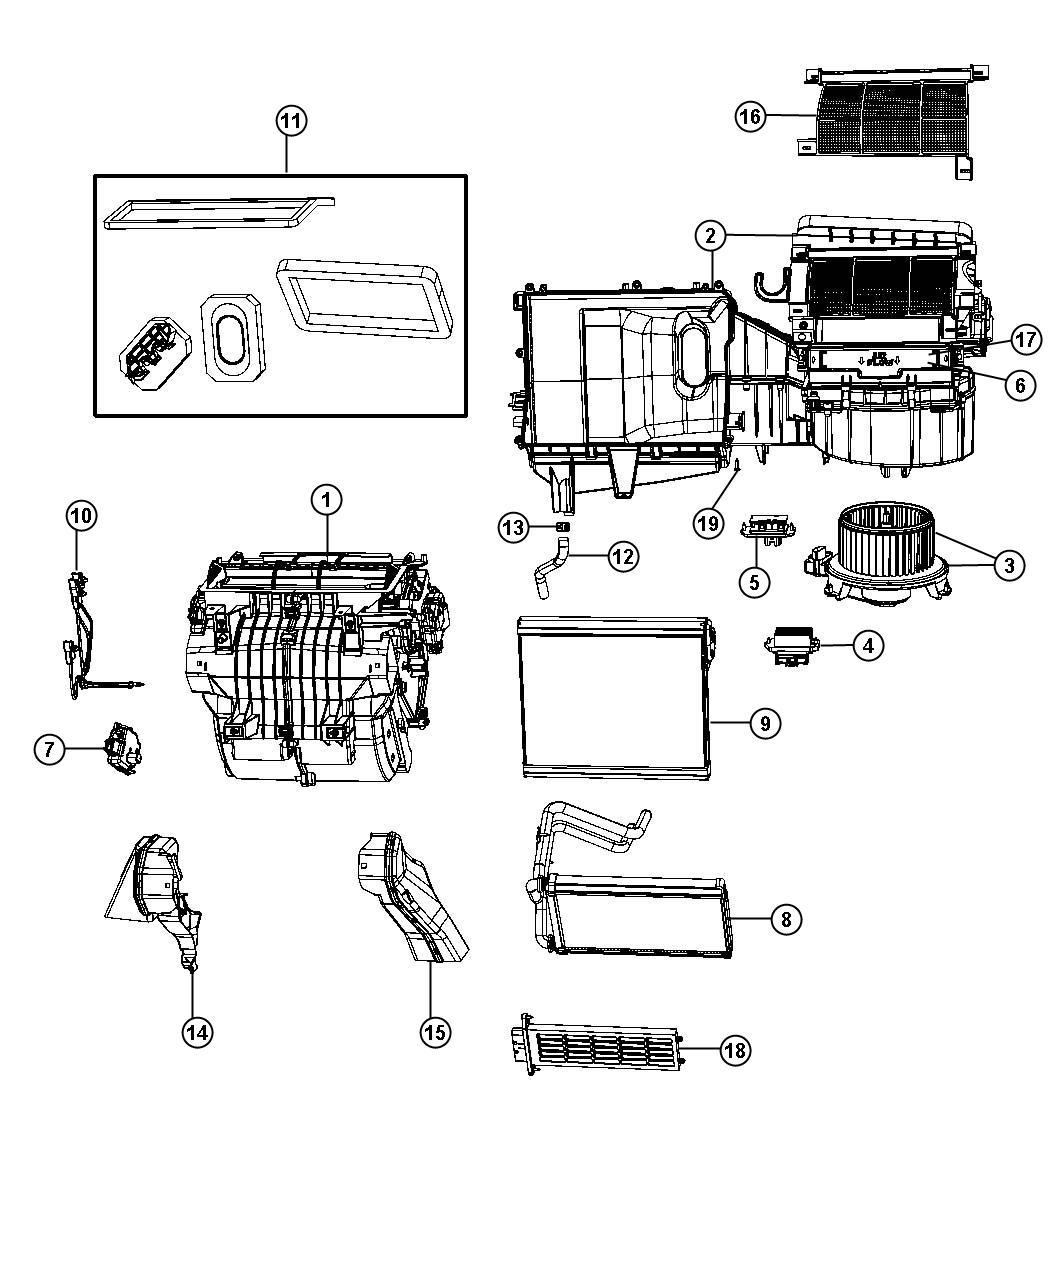 Dodge Avenger Actuator Replacement Help